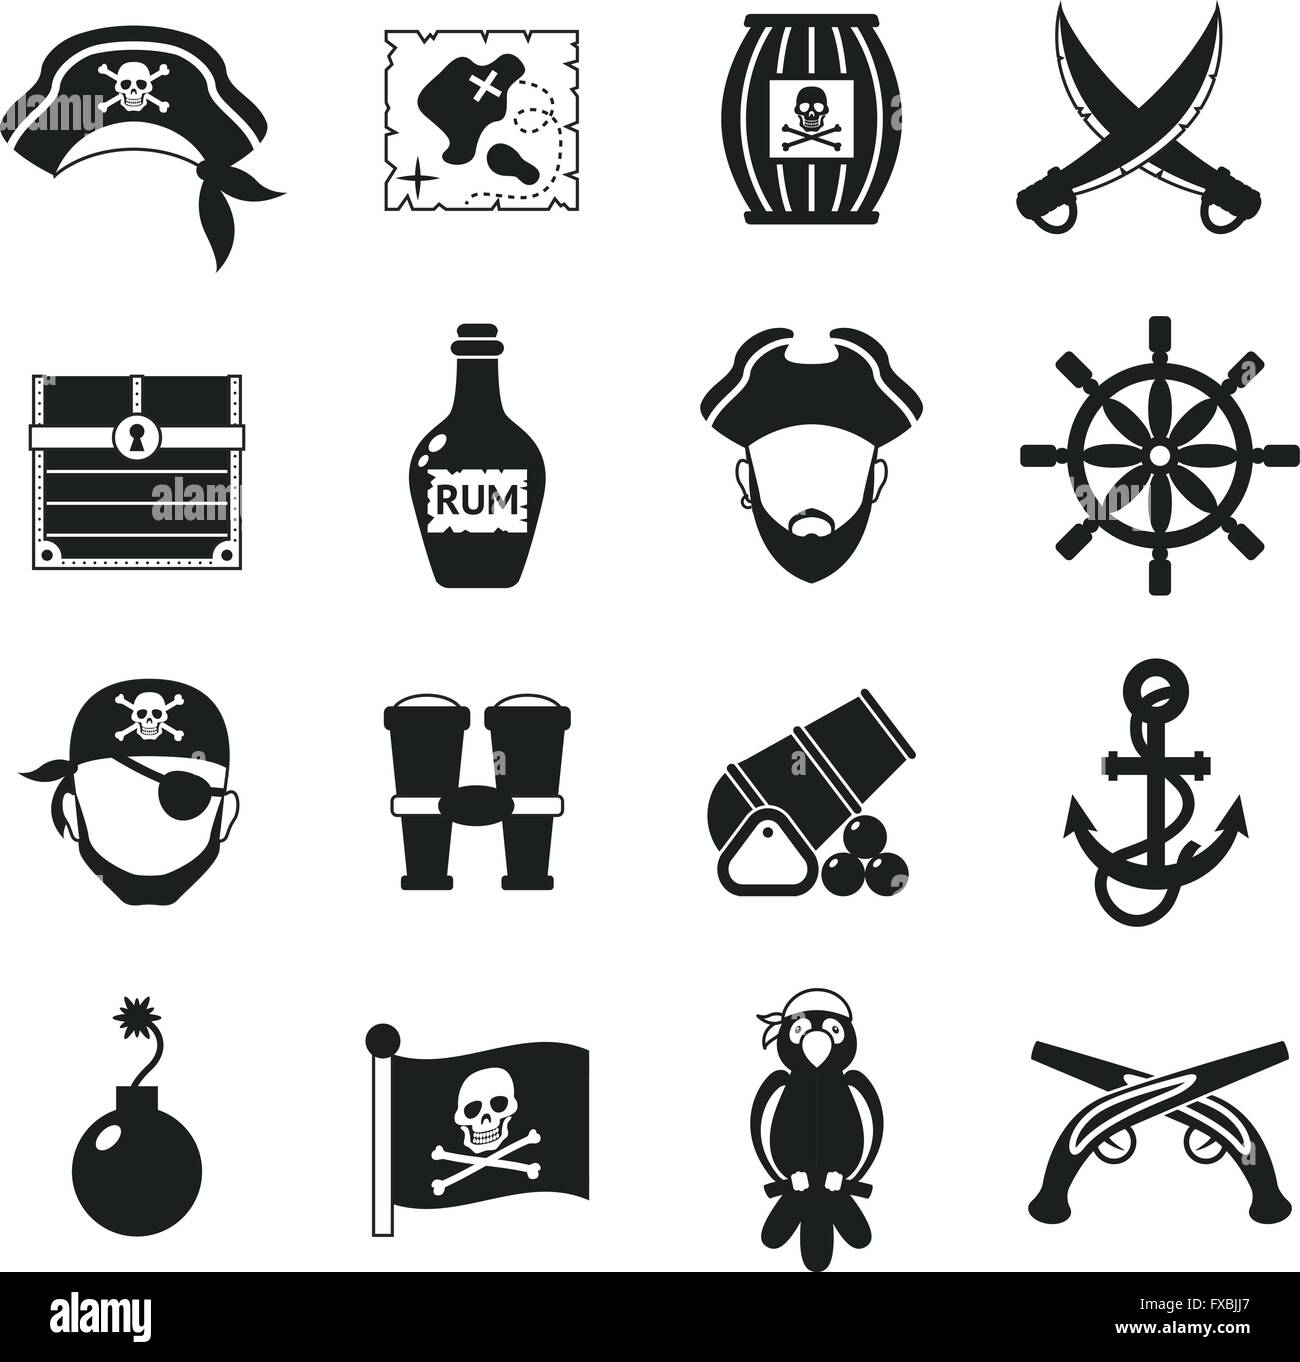 Pirate icons set black Stock Vector Art & Illustration